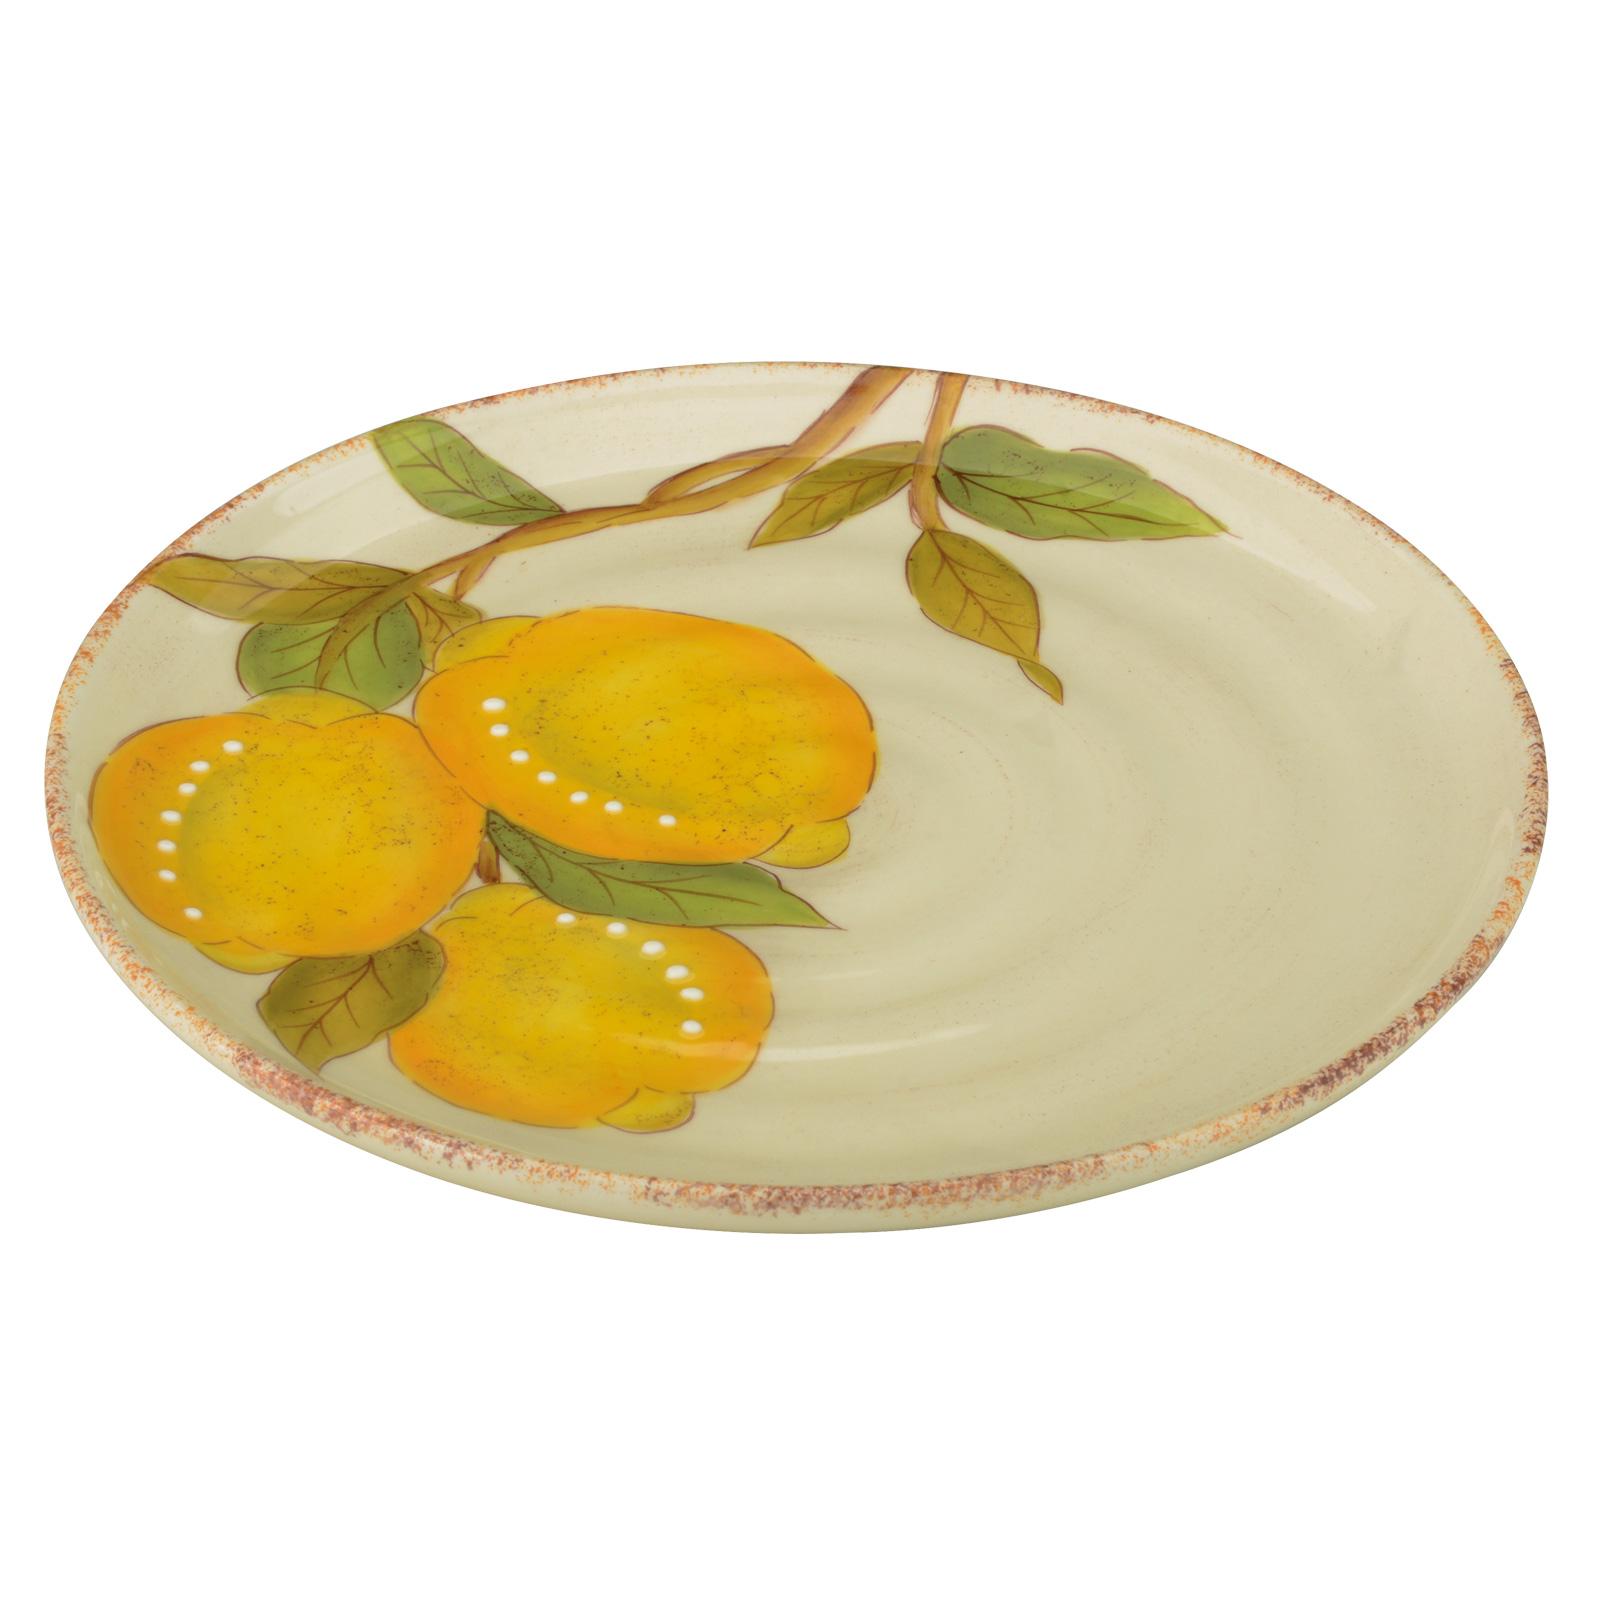 Sorrento Salad Plate